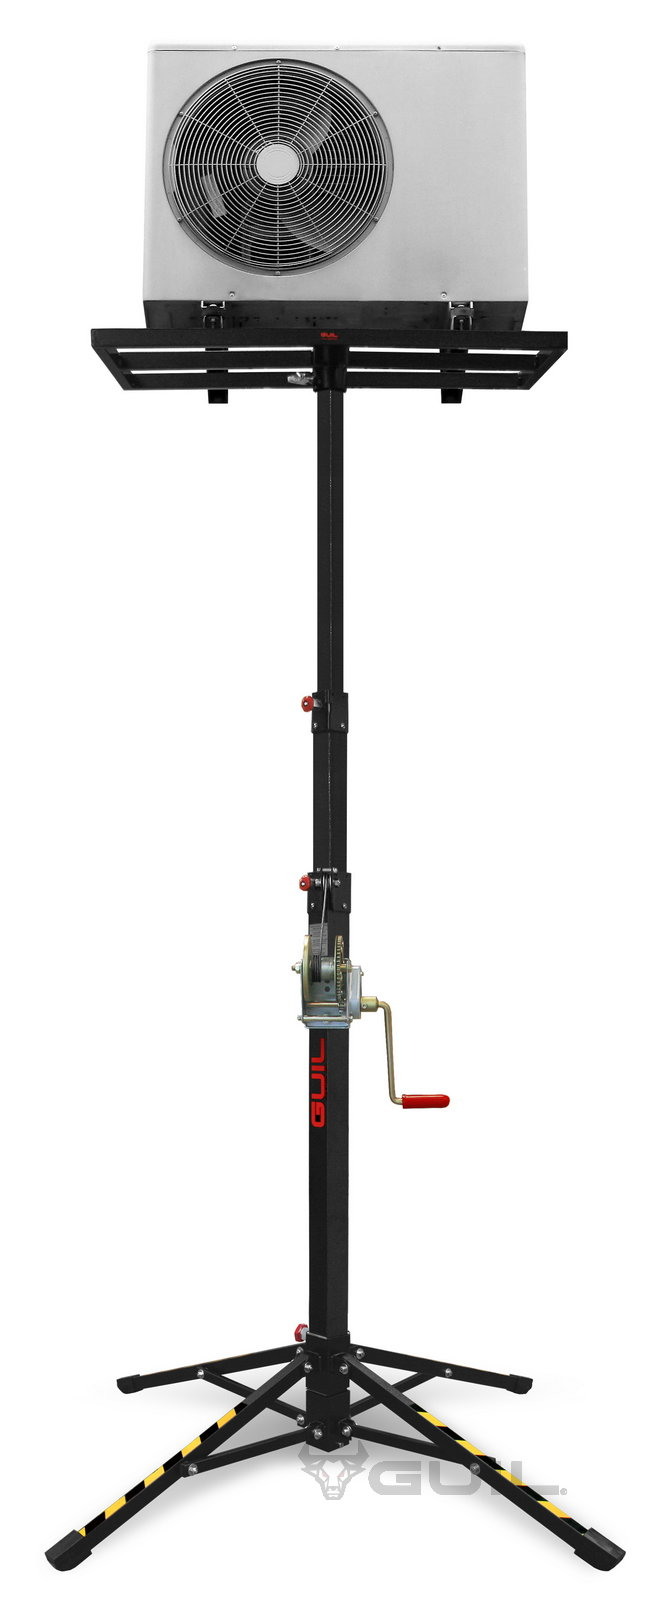 Materiaallift 1,4-3,5 m 125 kg (dutch) (7)